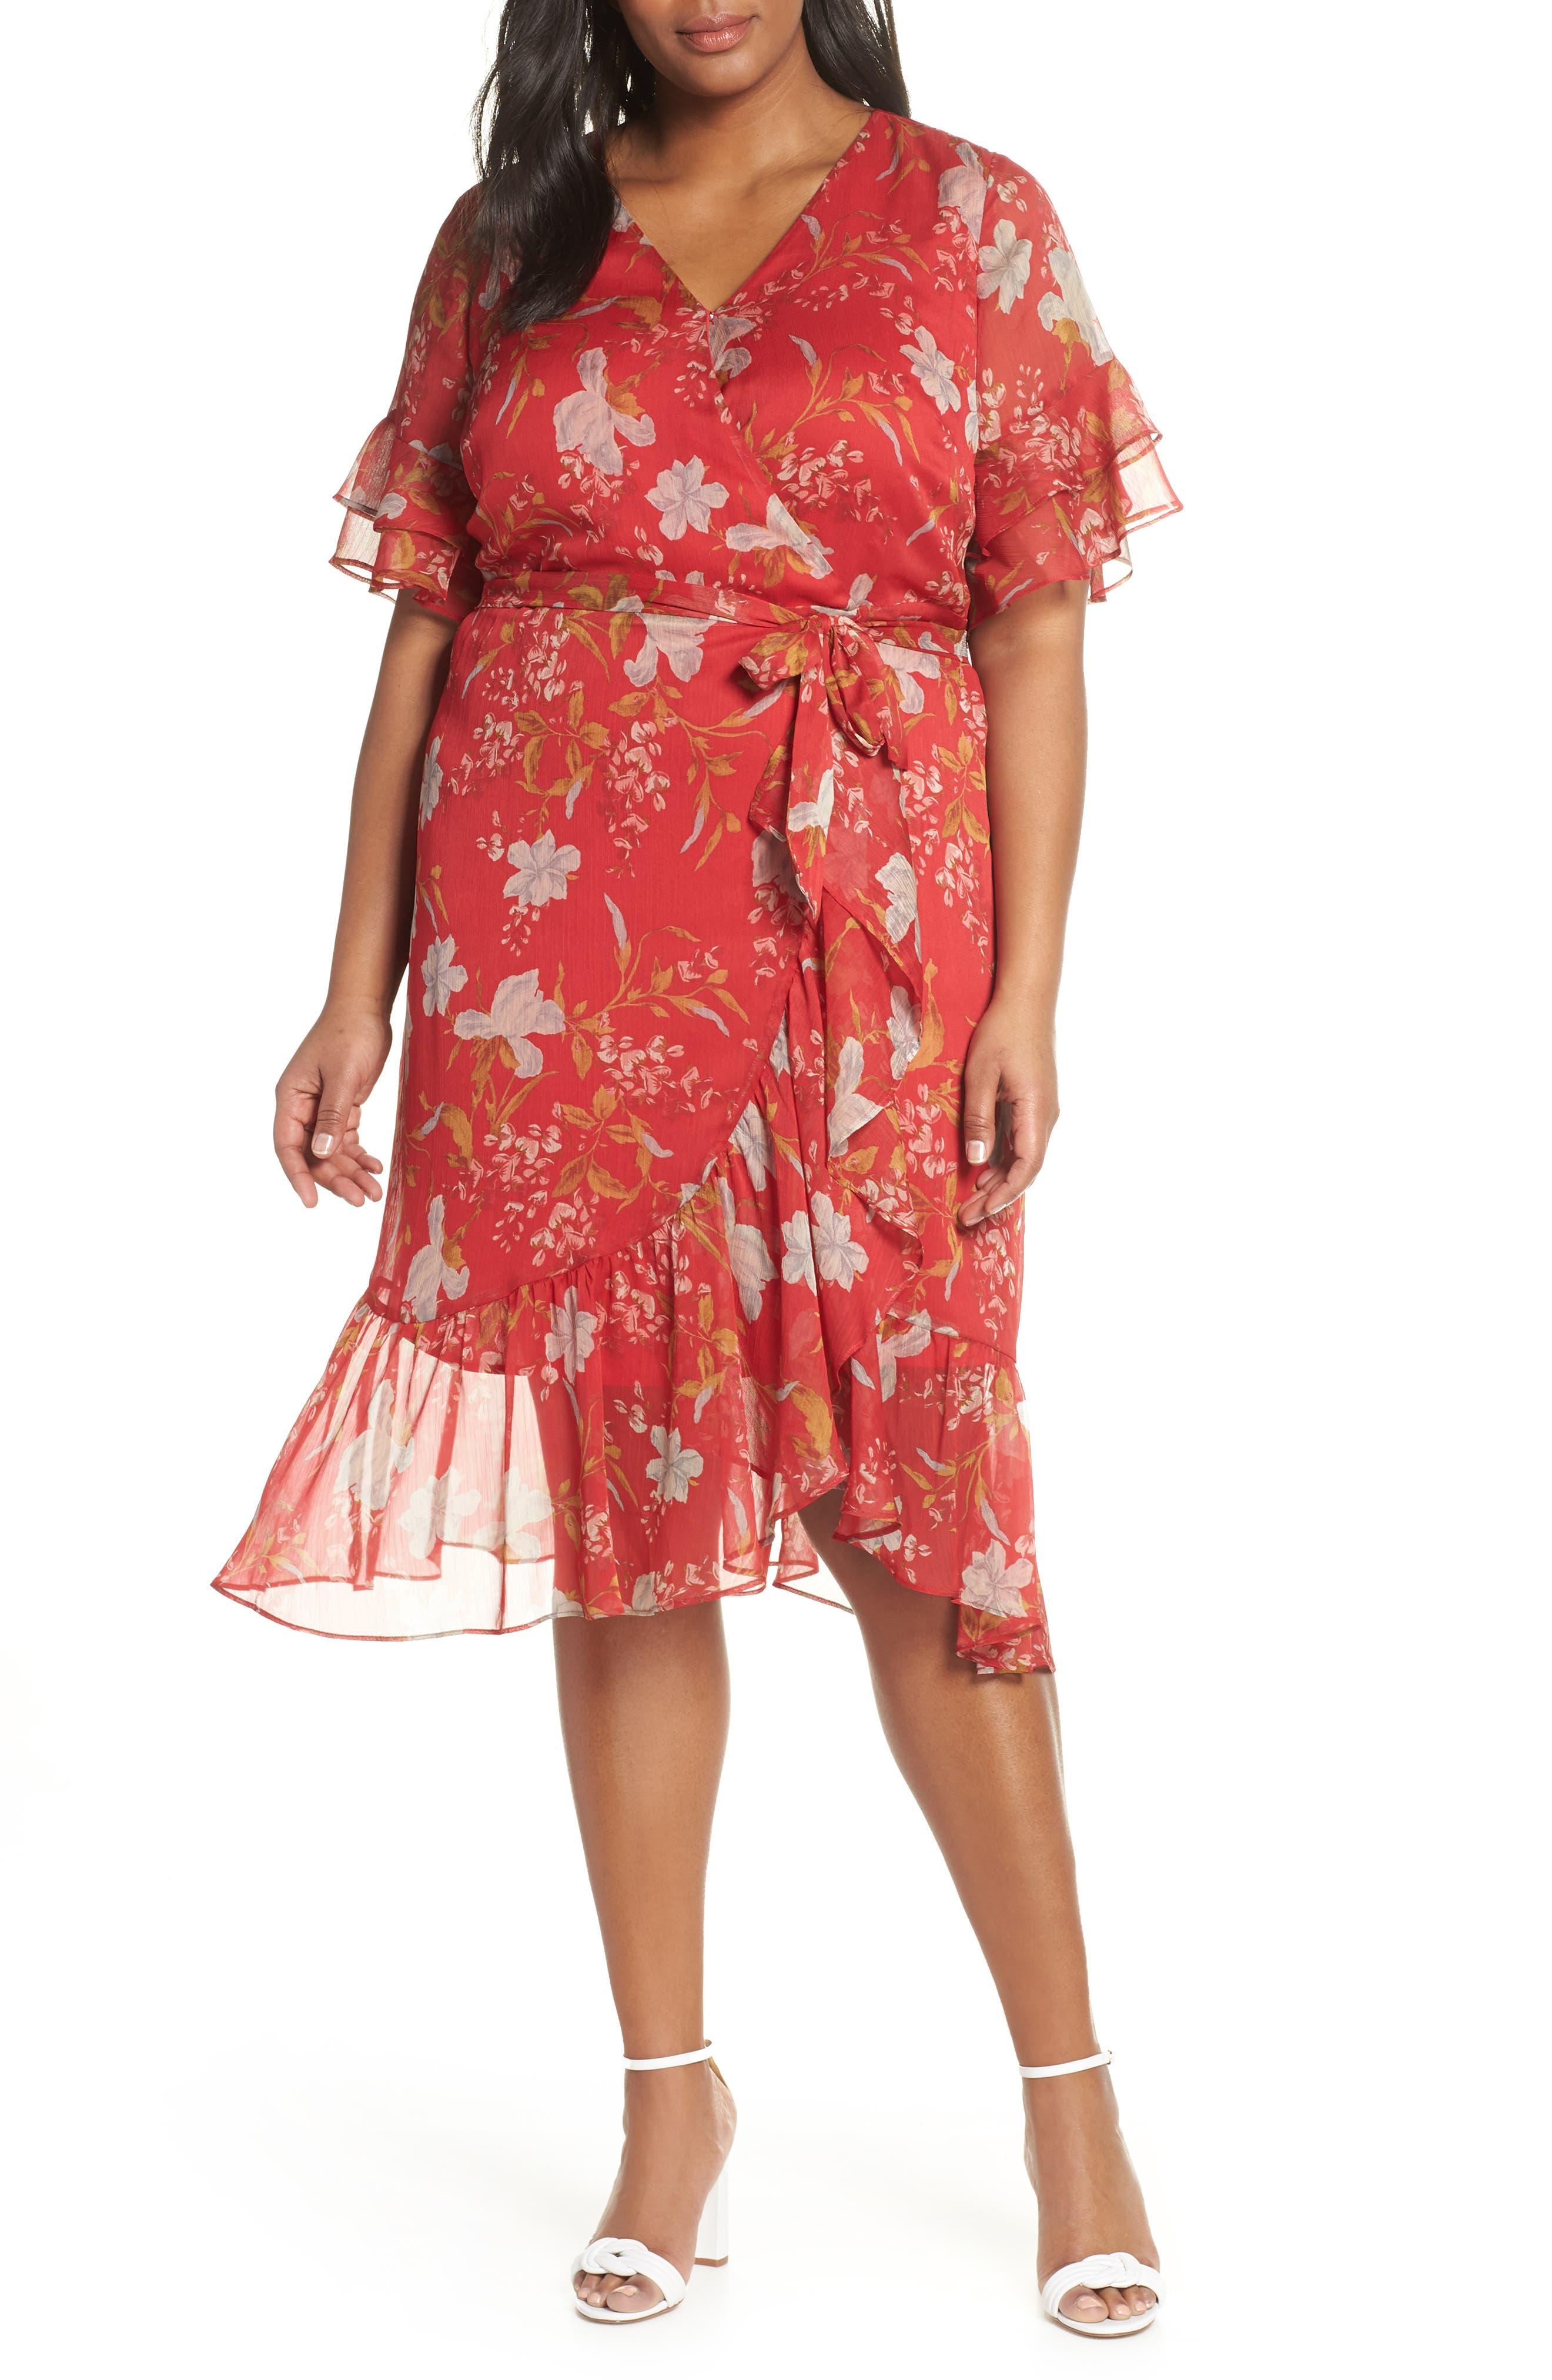 1930s Art Deco Plus Size Dresses | Tea Dresses, Party Dresses Plus Size Womens Vince Camuto Wildflower Tiered Ruffle Chiffon Dress Size 24W - Red $179.00 AT vintagedancer.com